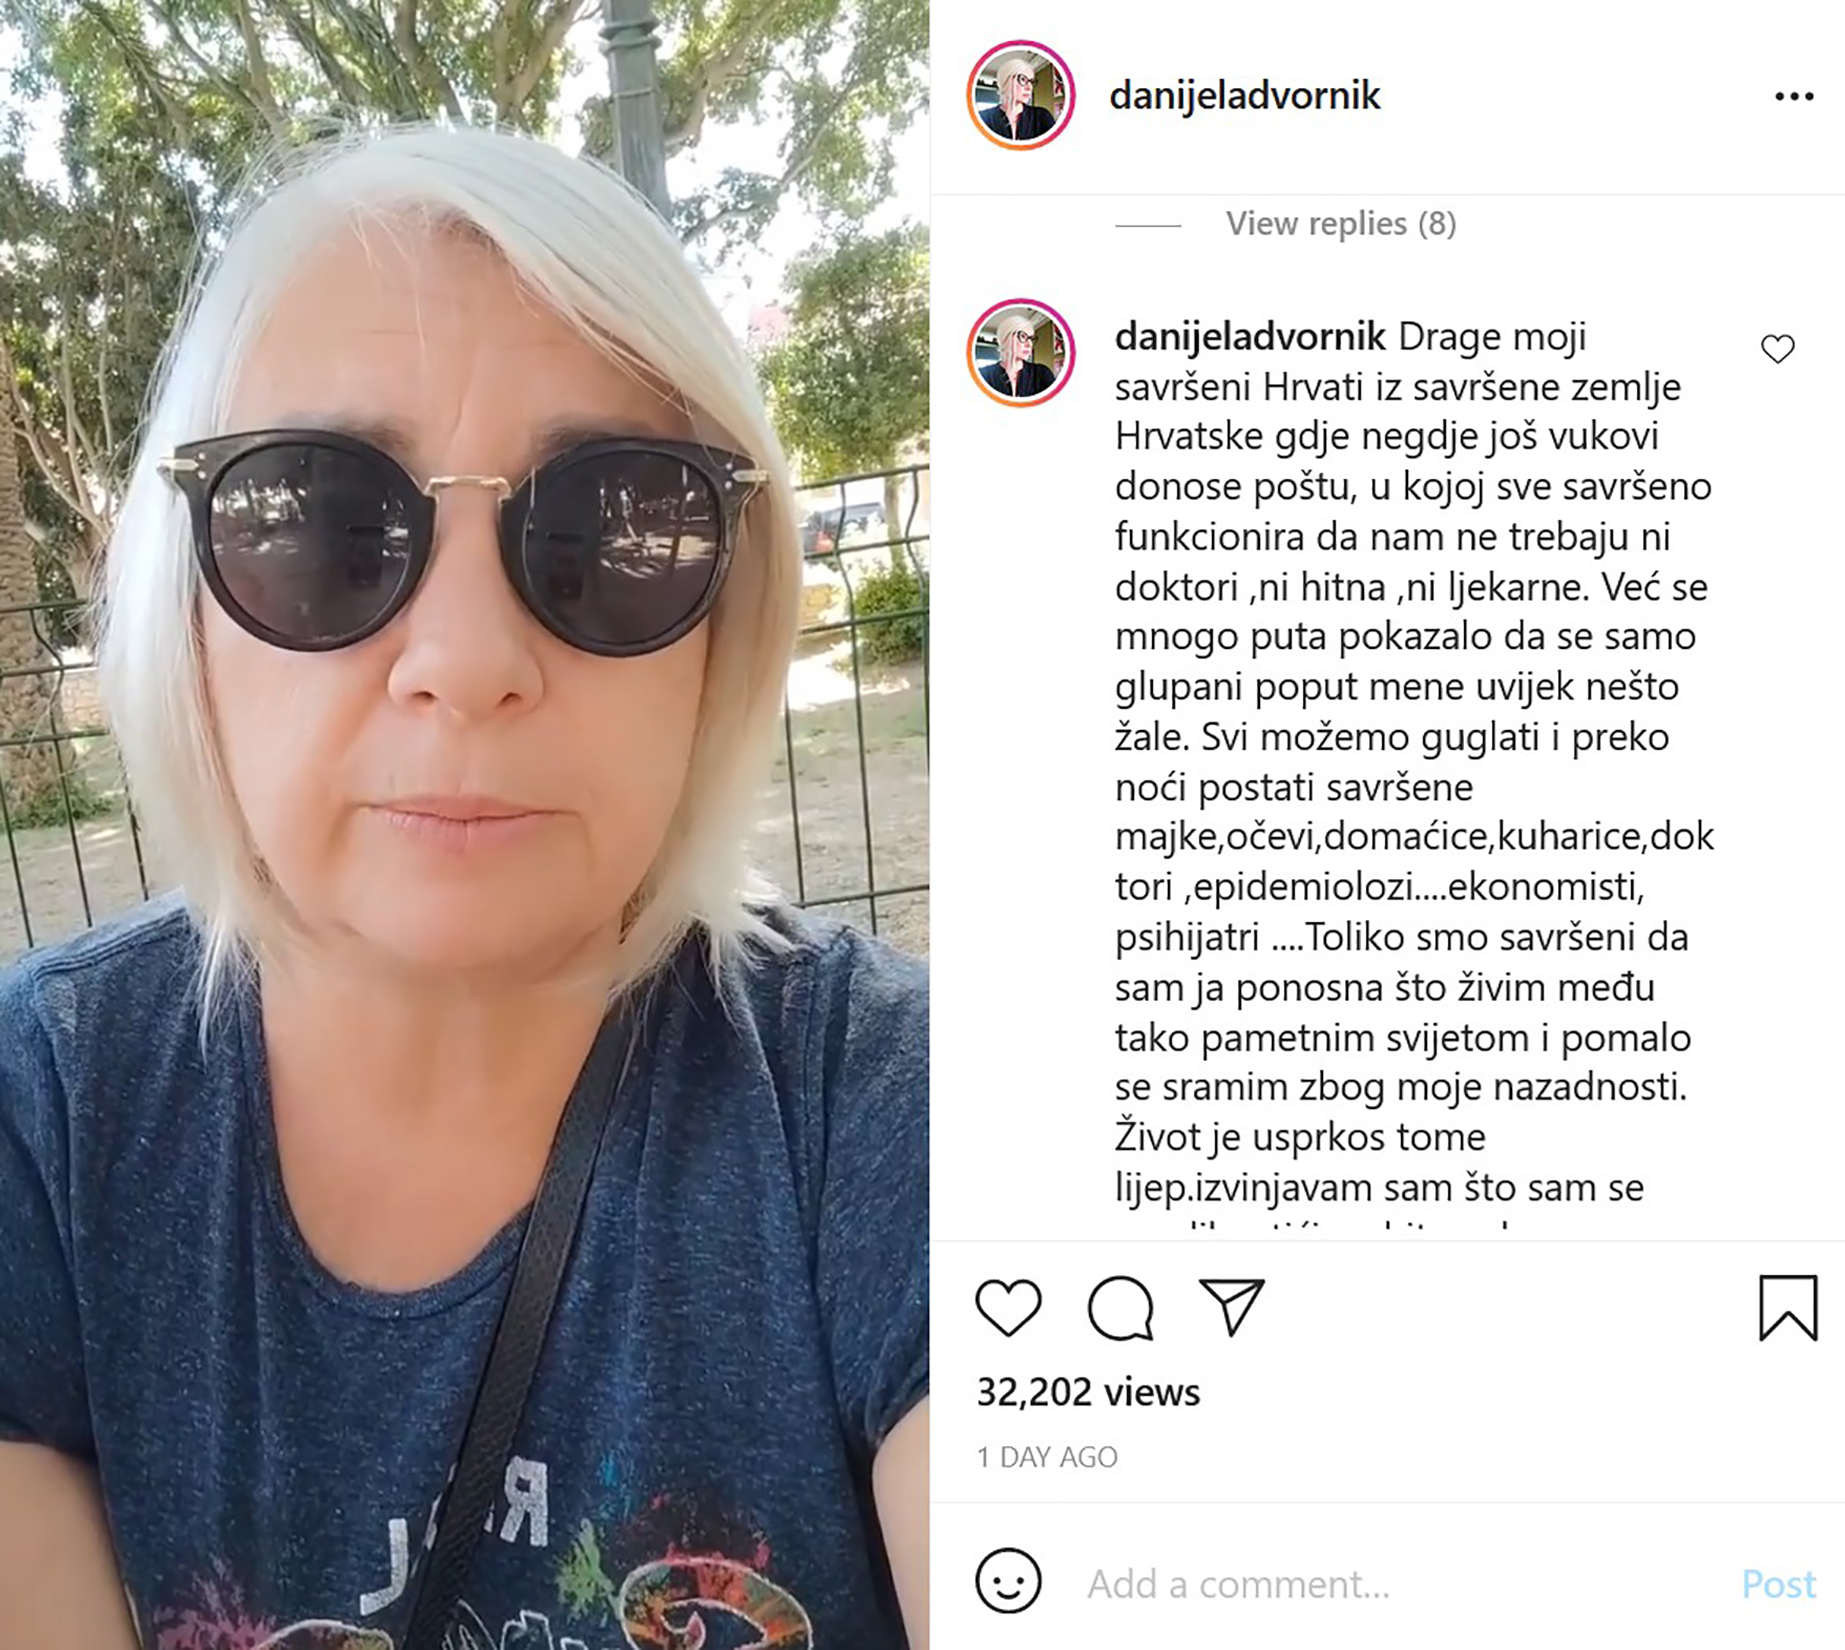 Danijela Dvornik, komentar, instagram